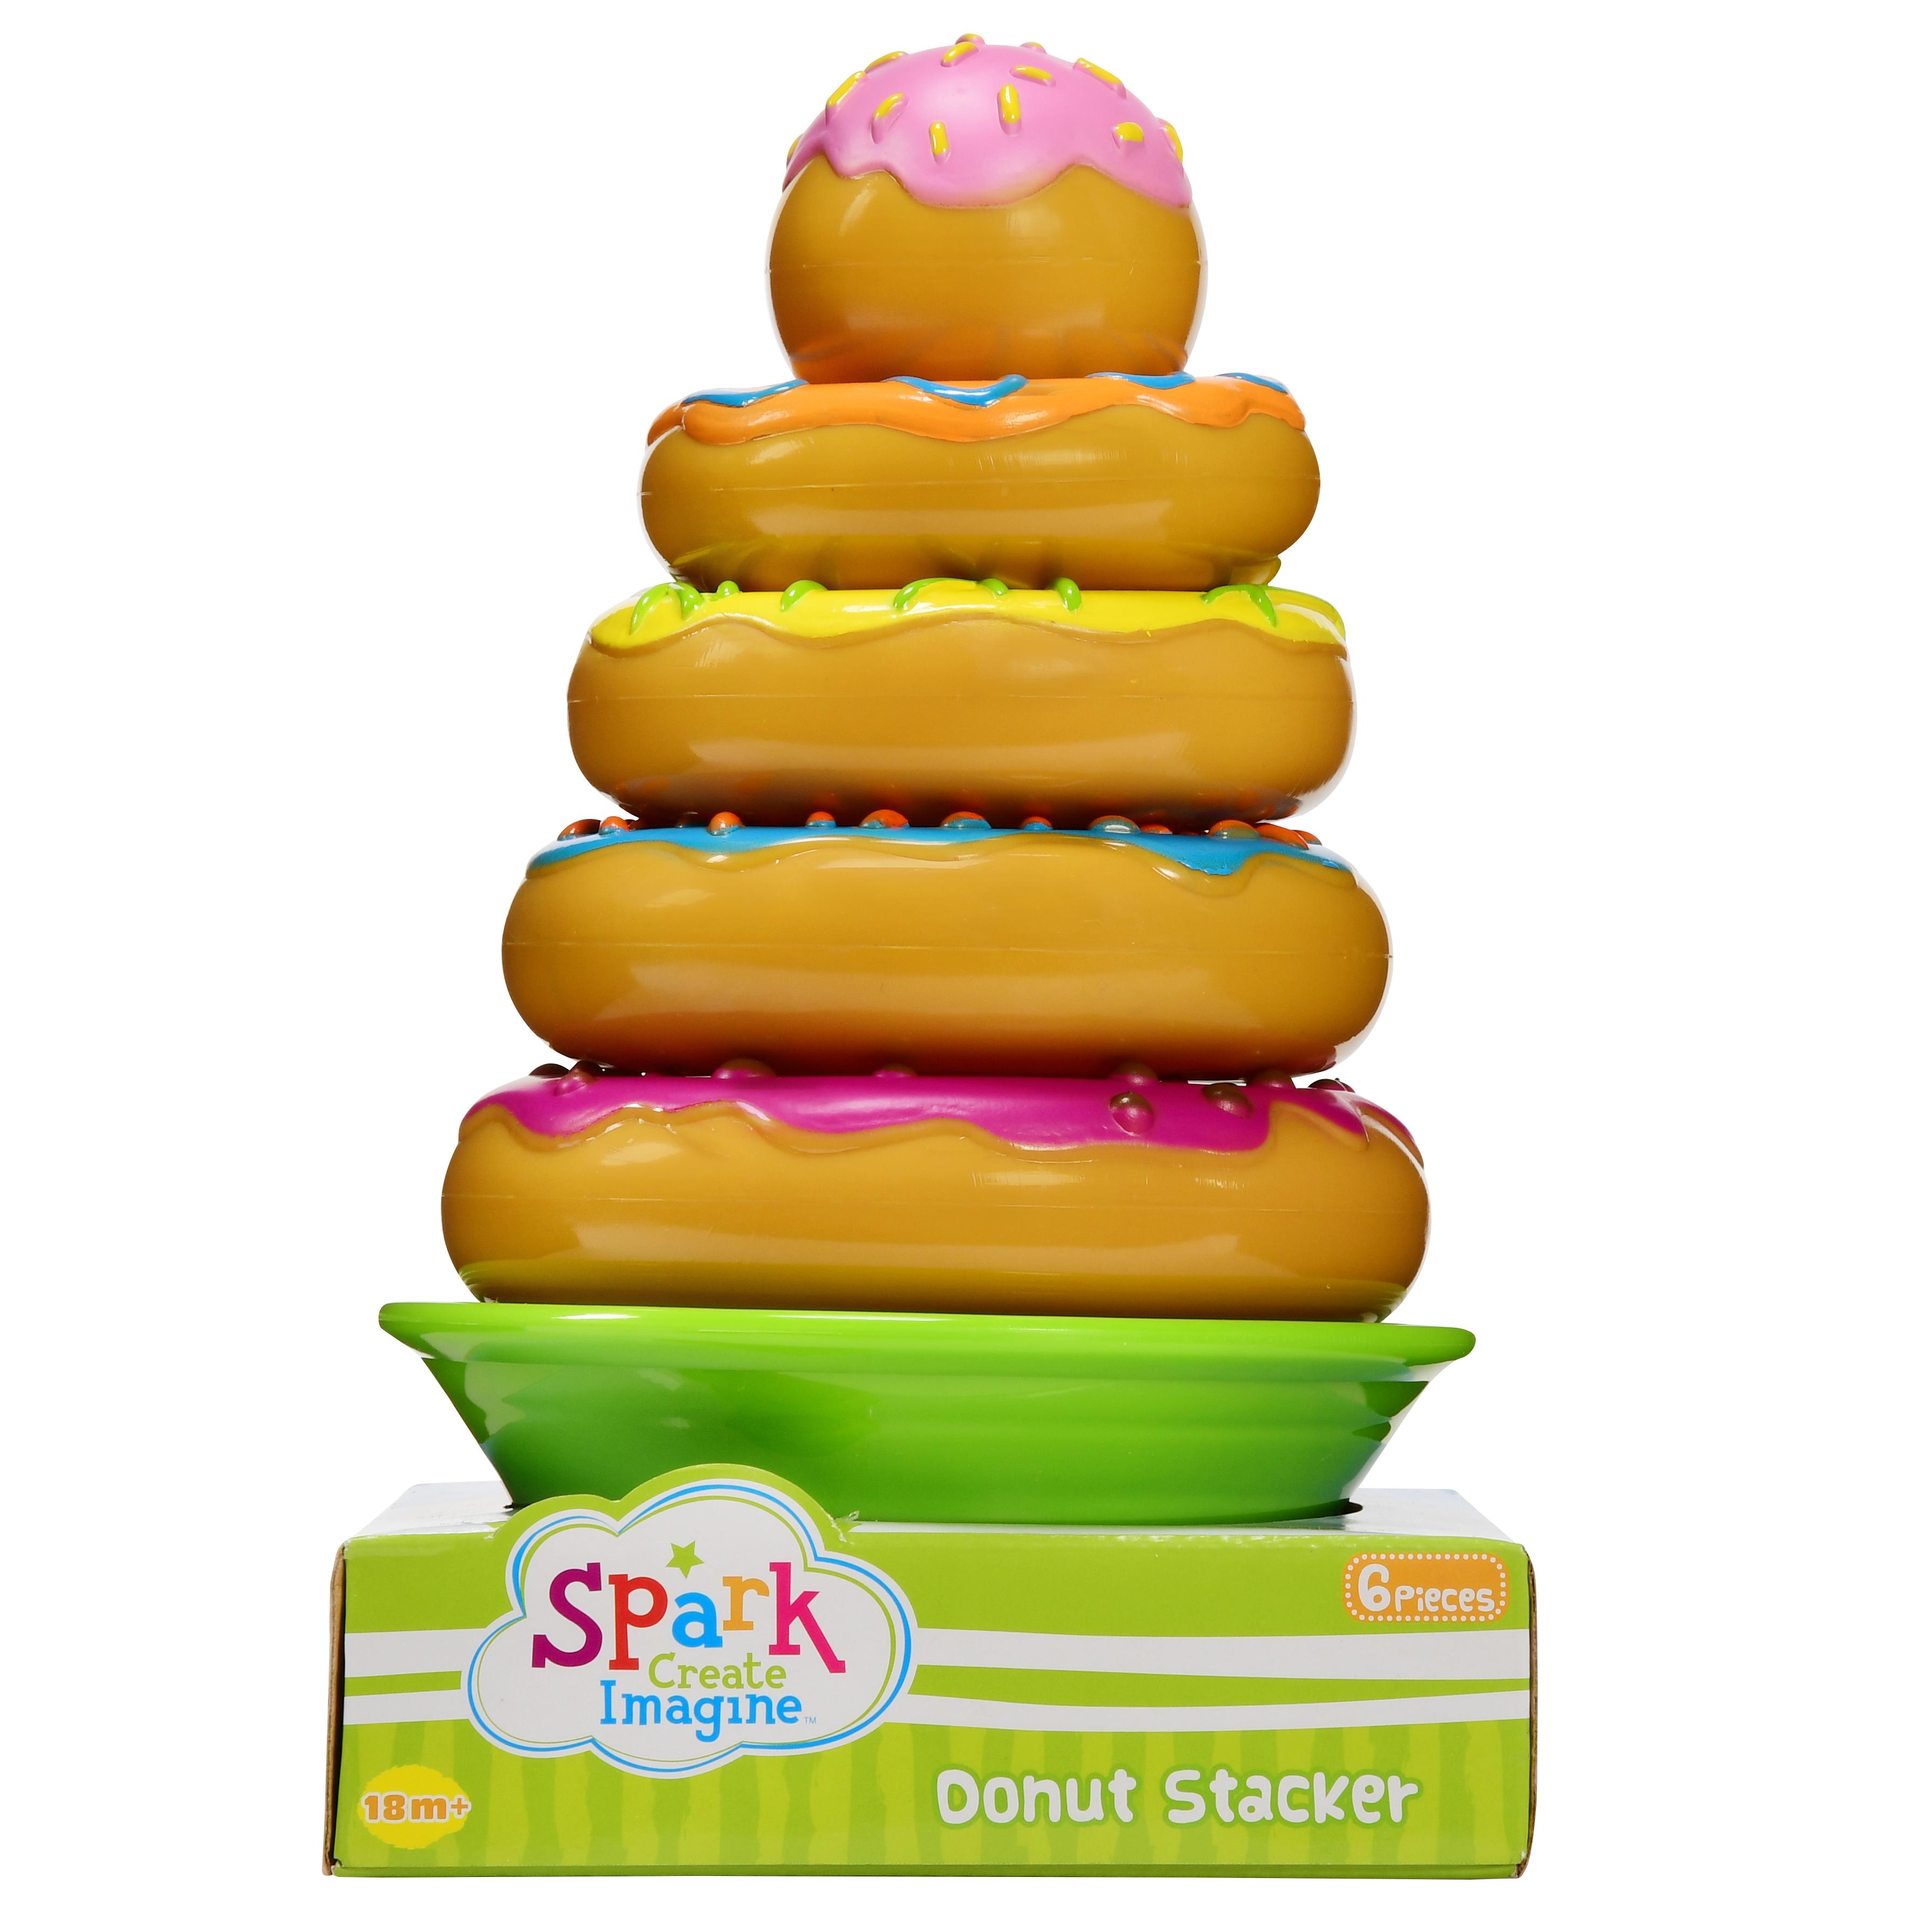 Spark Create Imagine Doughnut Stacker